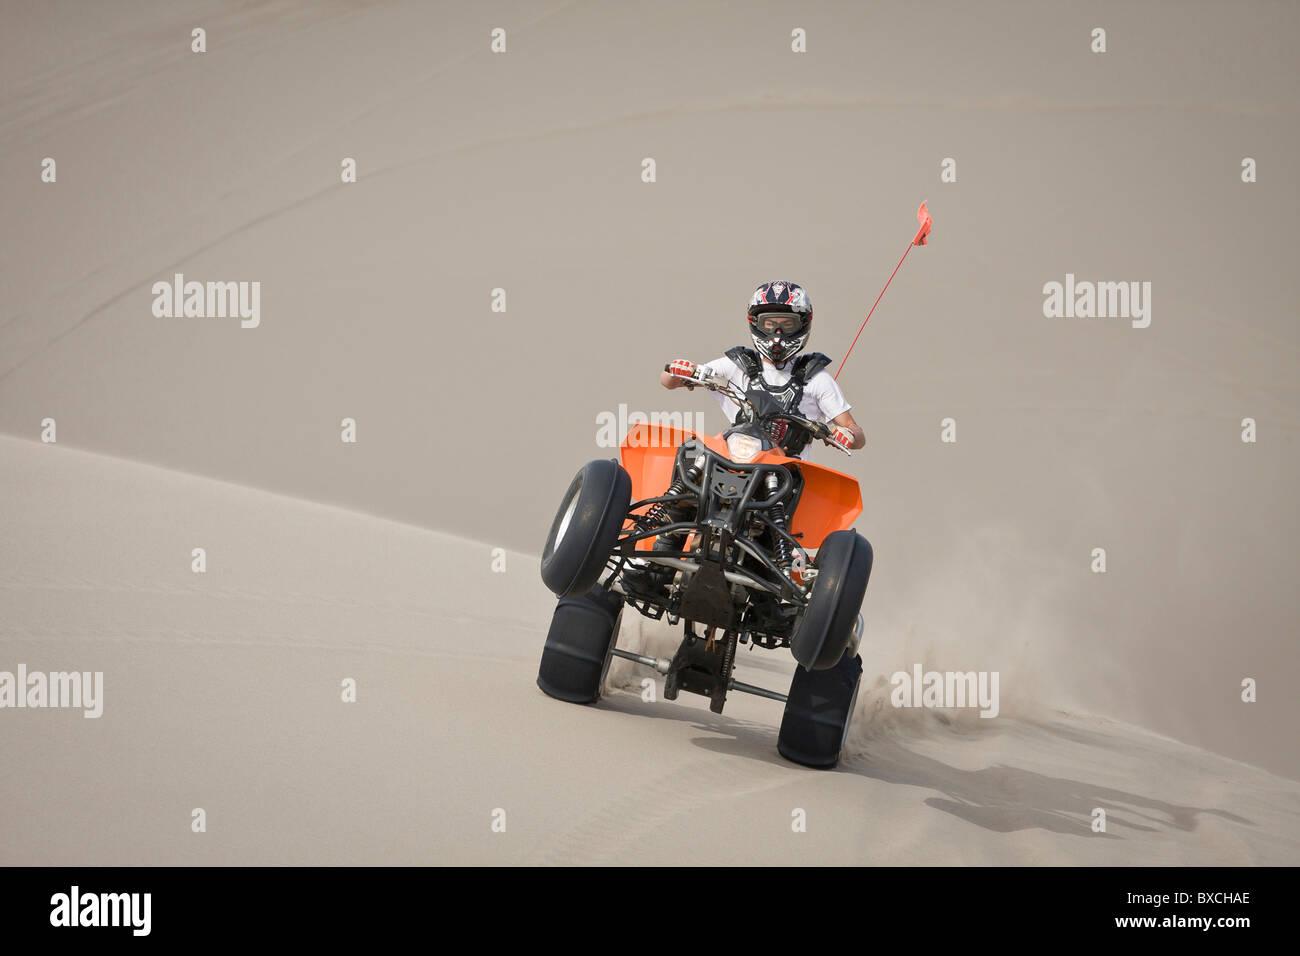 Teen boy riding ATV in sand dunes pulling a wheelie - Stock Image